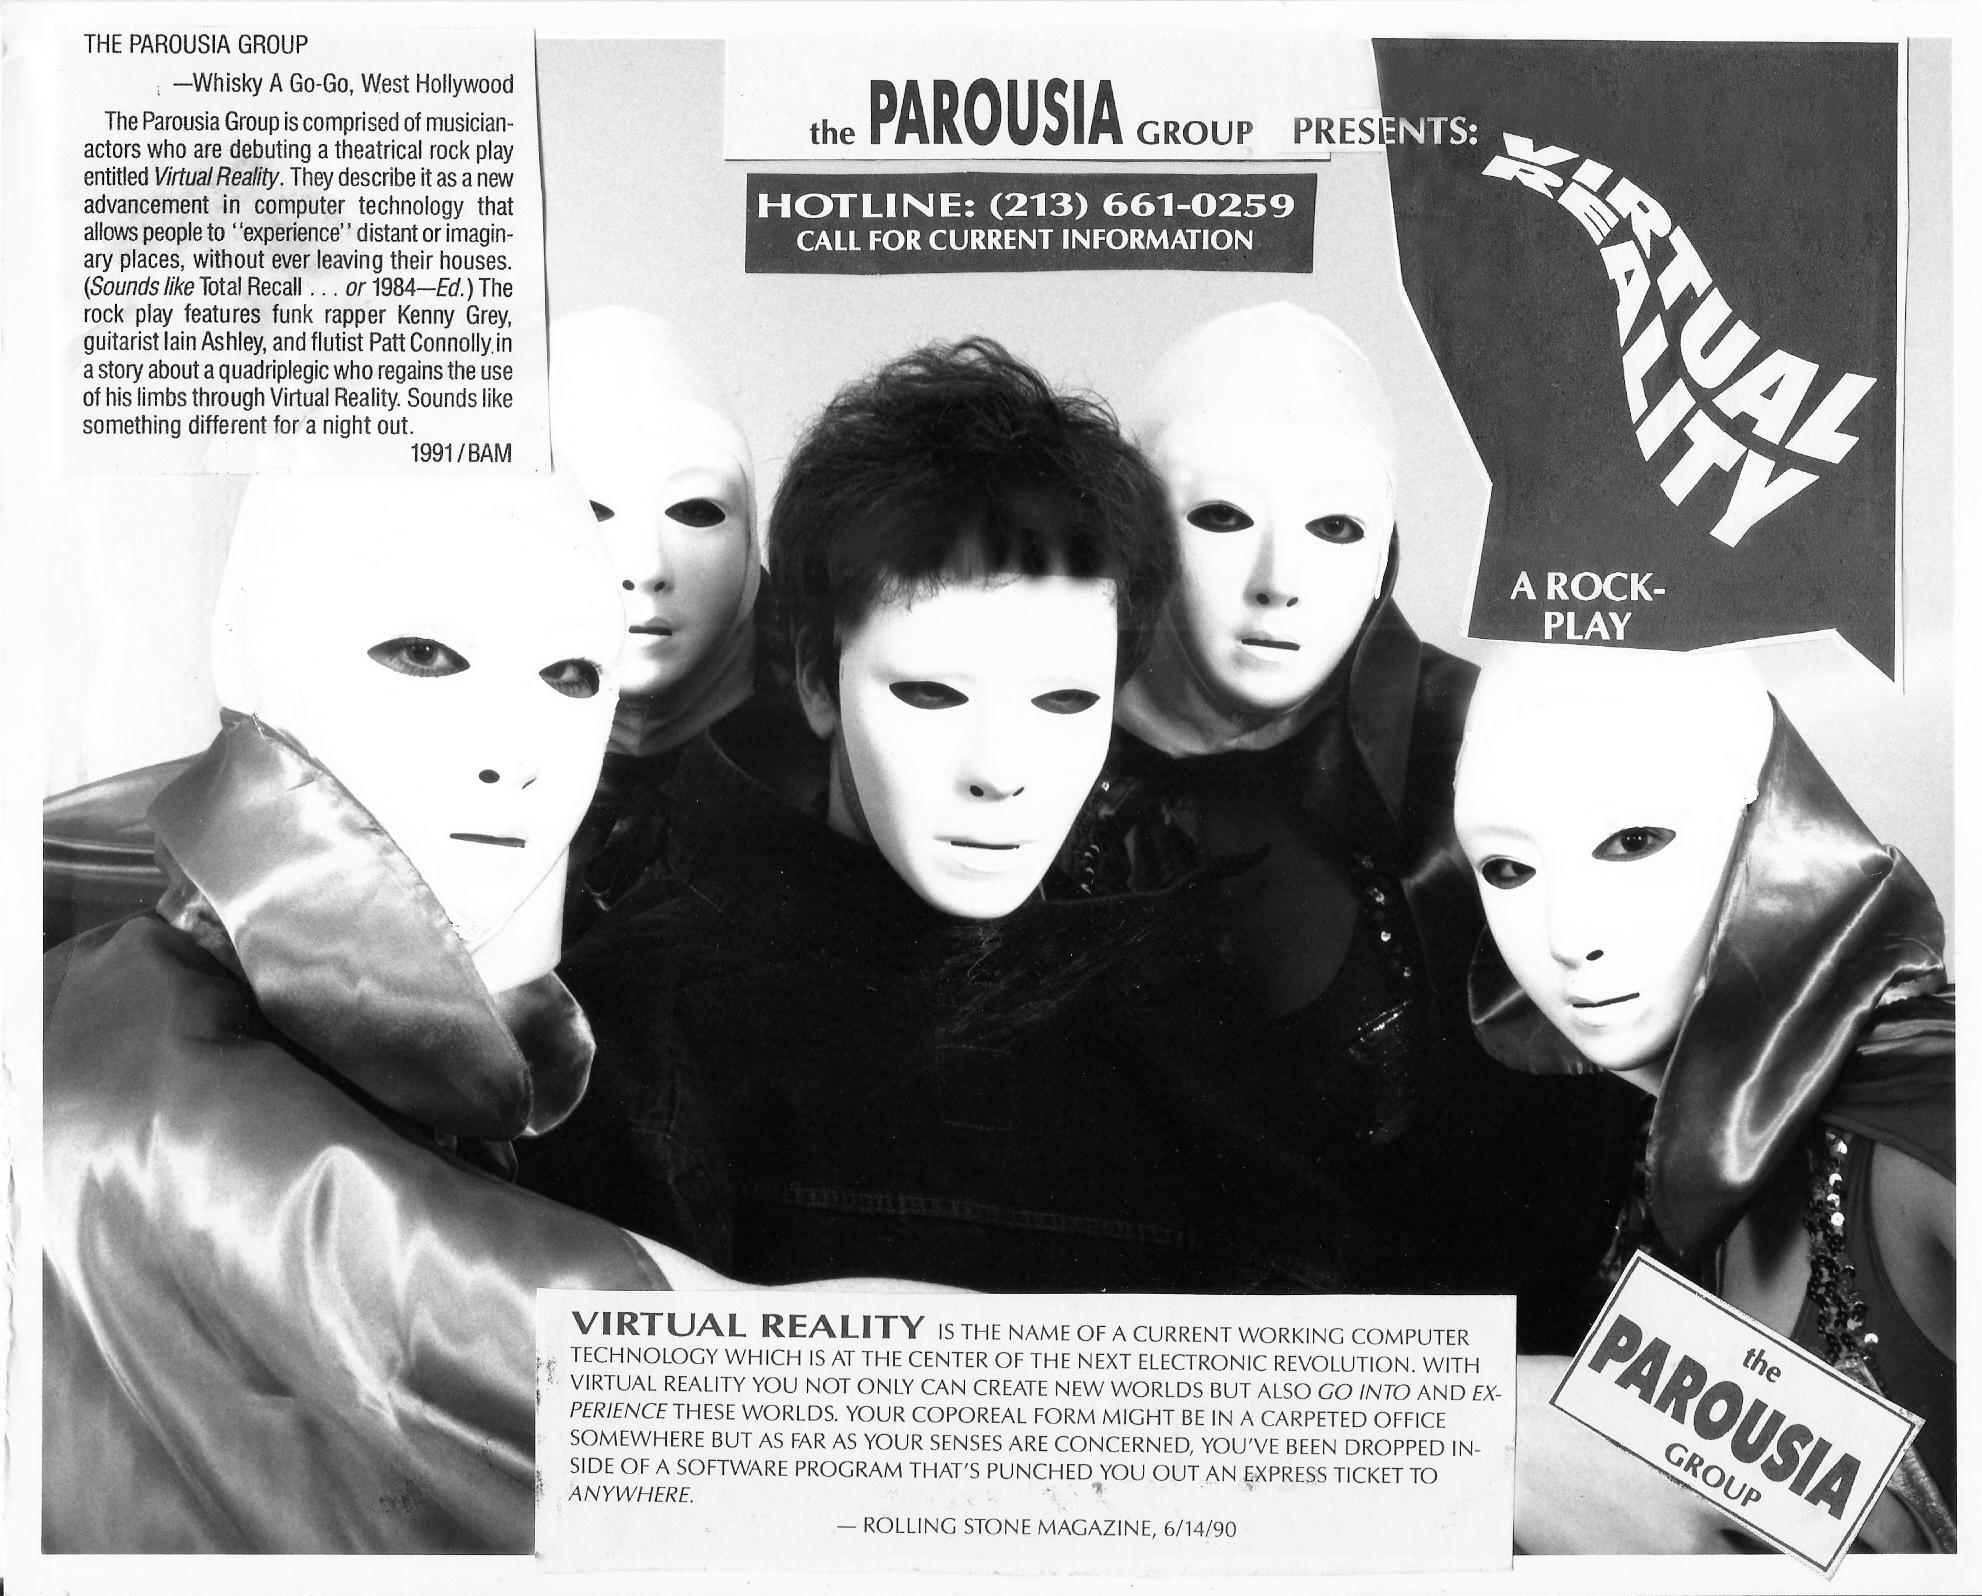 Virtual Reality - Bam magazine Jan. 1991